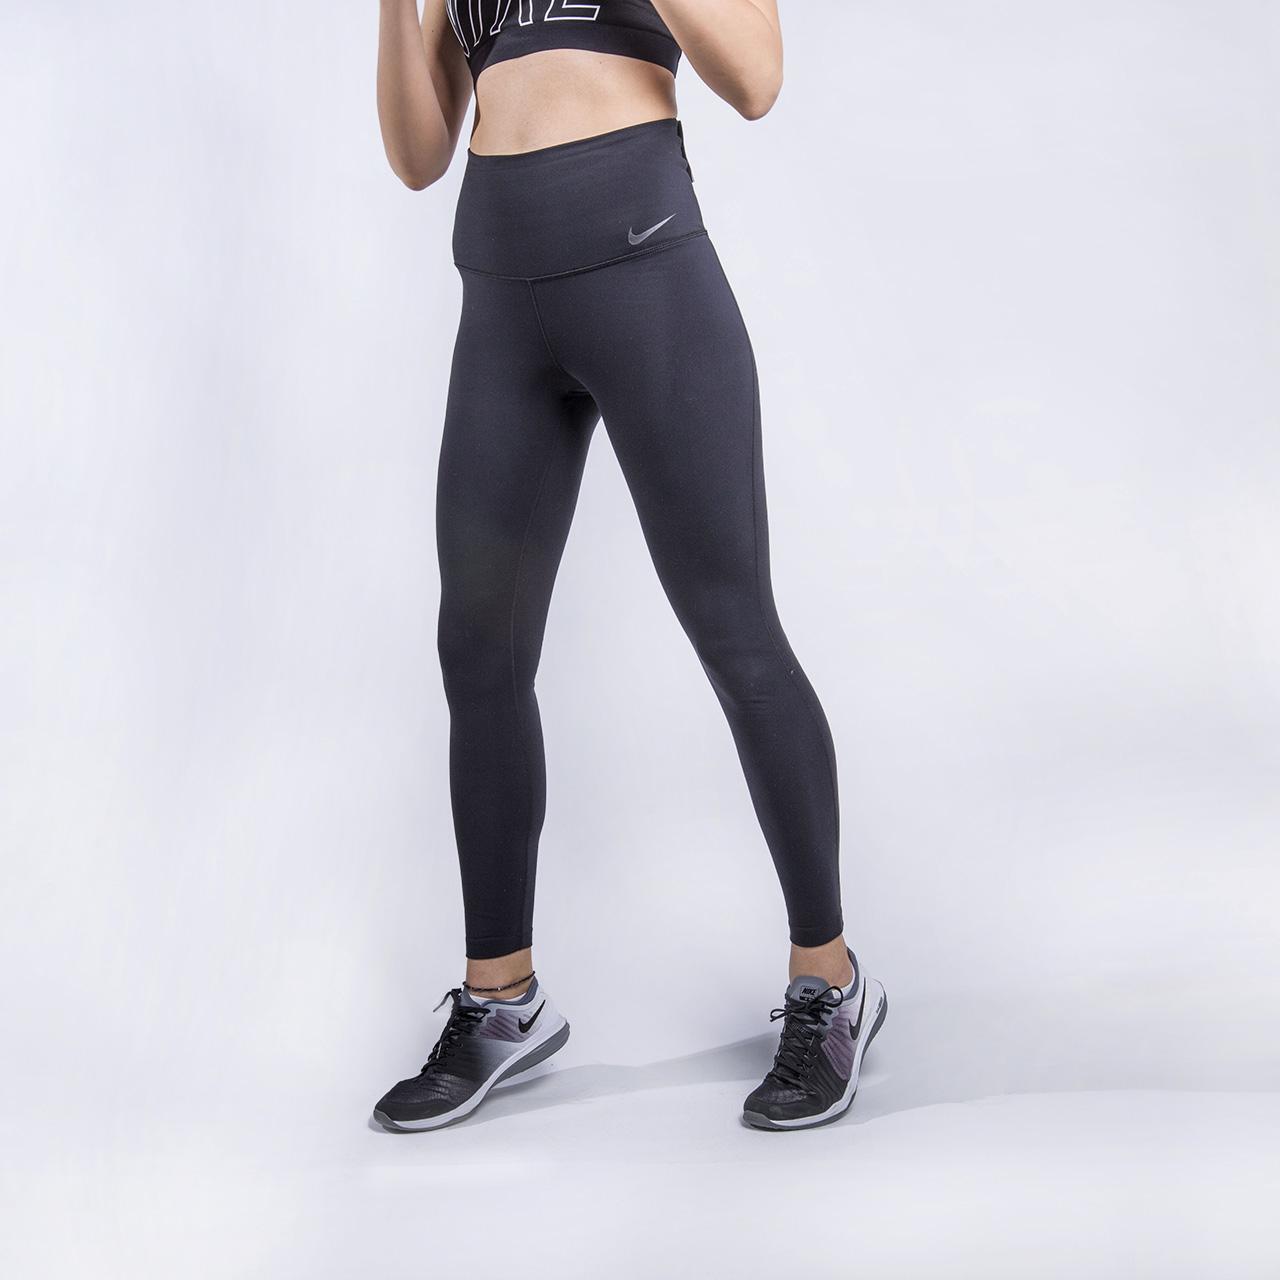 Тайтсы для тренинга Nike NK PWR TGHT Hi RiseБрюки и джинсы<br>80% нейлон, 20% эластан<br><br>Цвет: Черный<br>Размеры US: XS;S;M<br>Пол: Женский